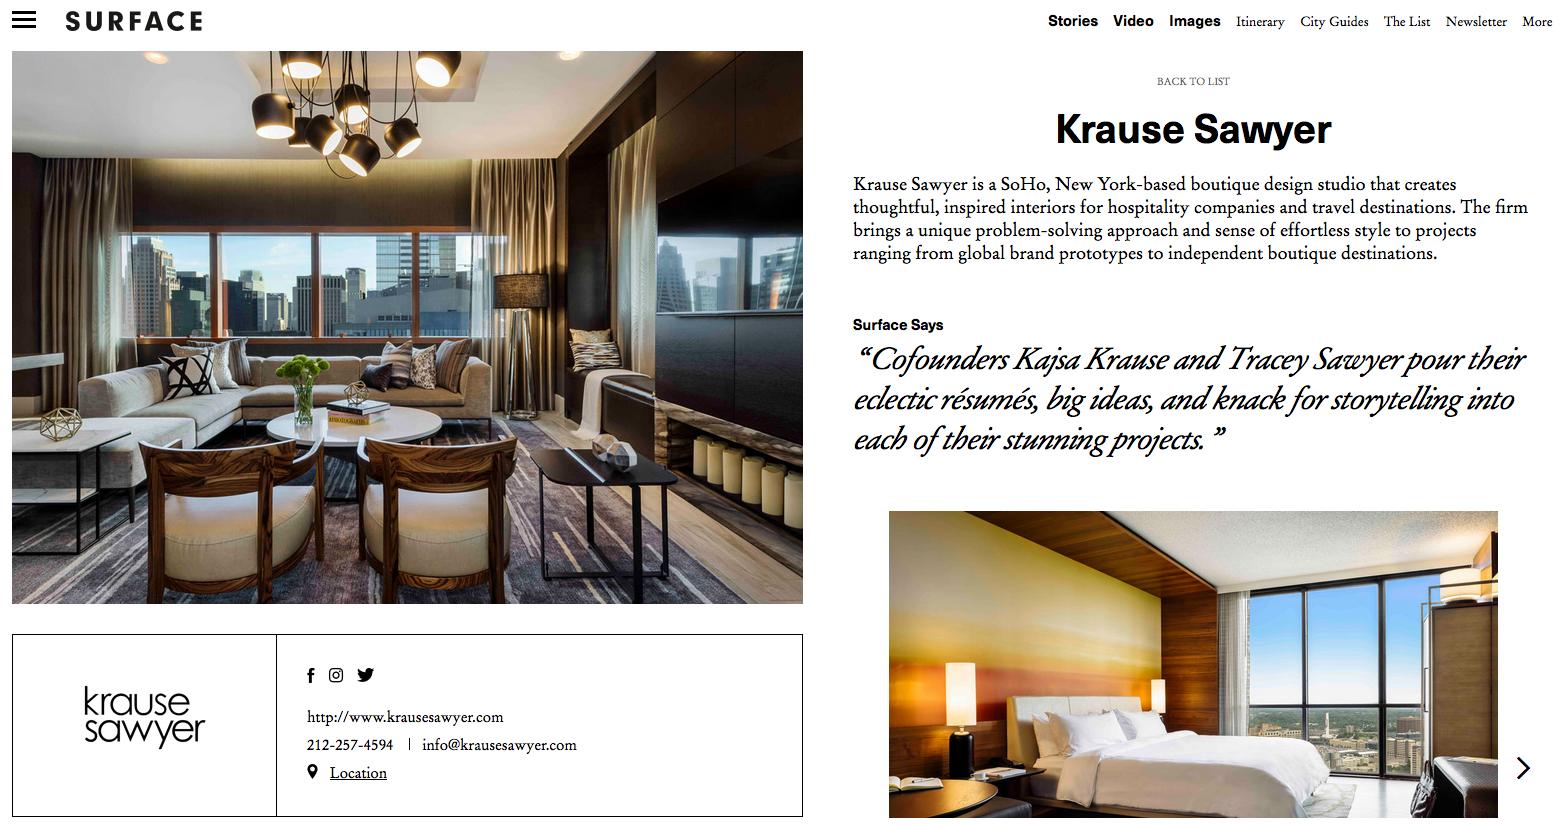 Krause sawyer featured as best interior design agency by - New york interior design firms ...